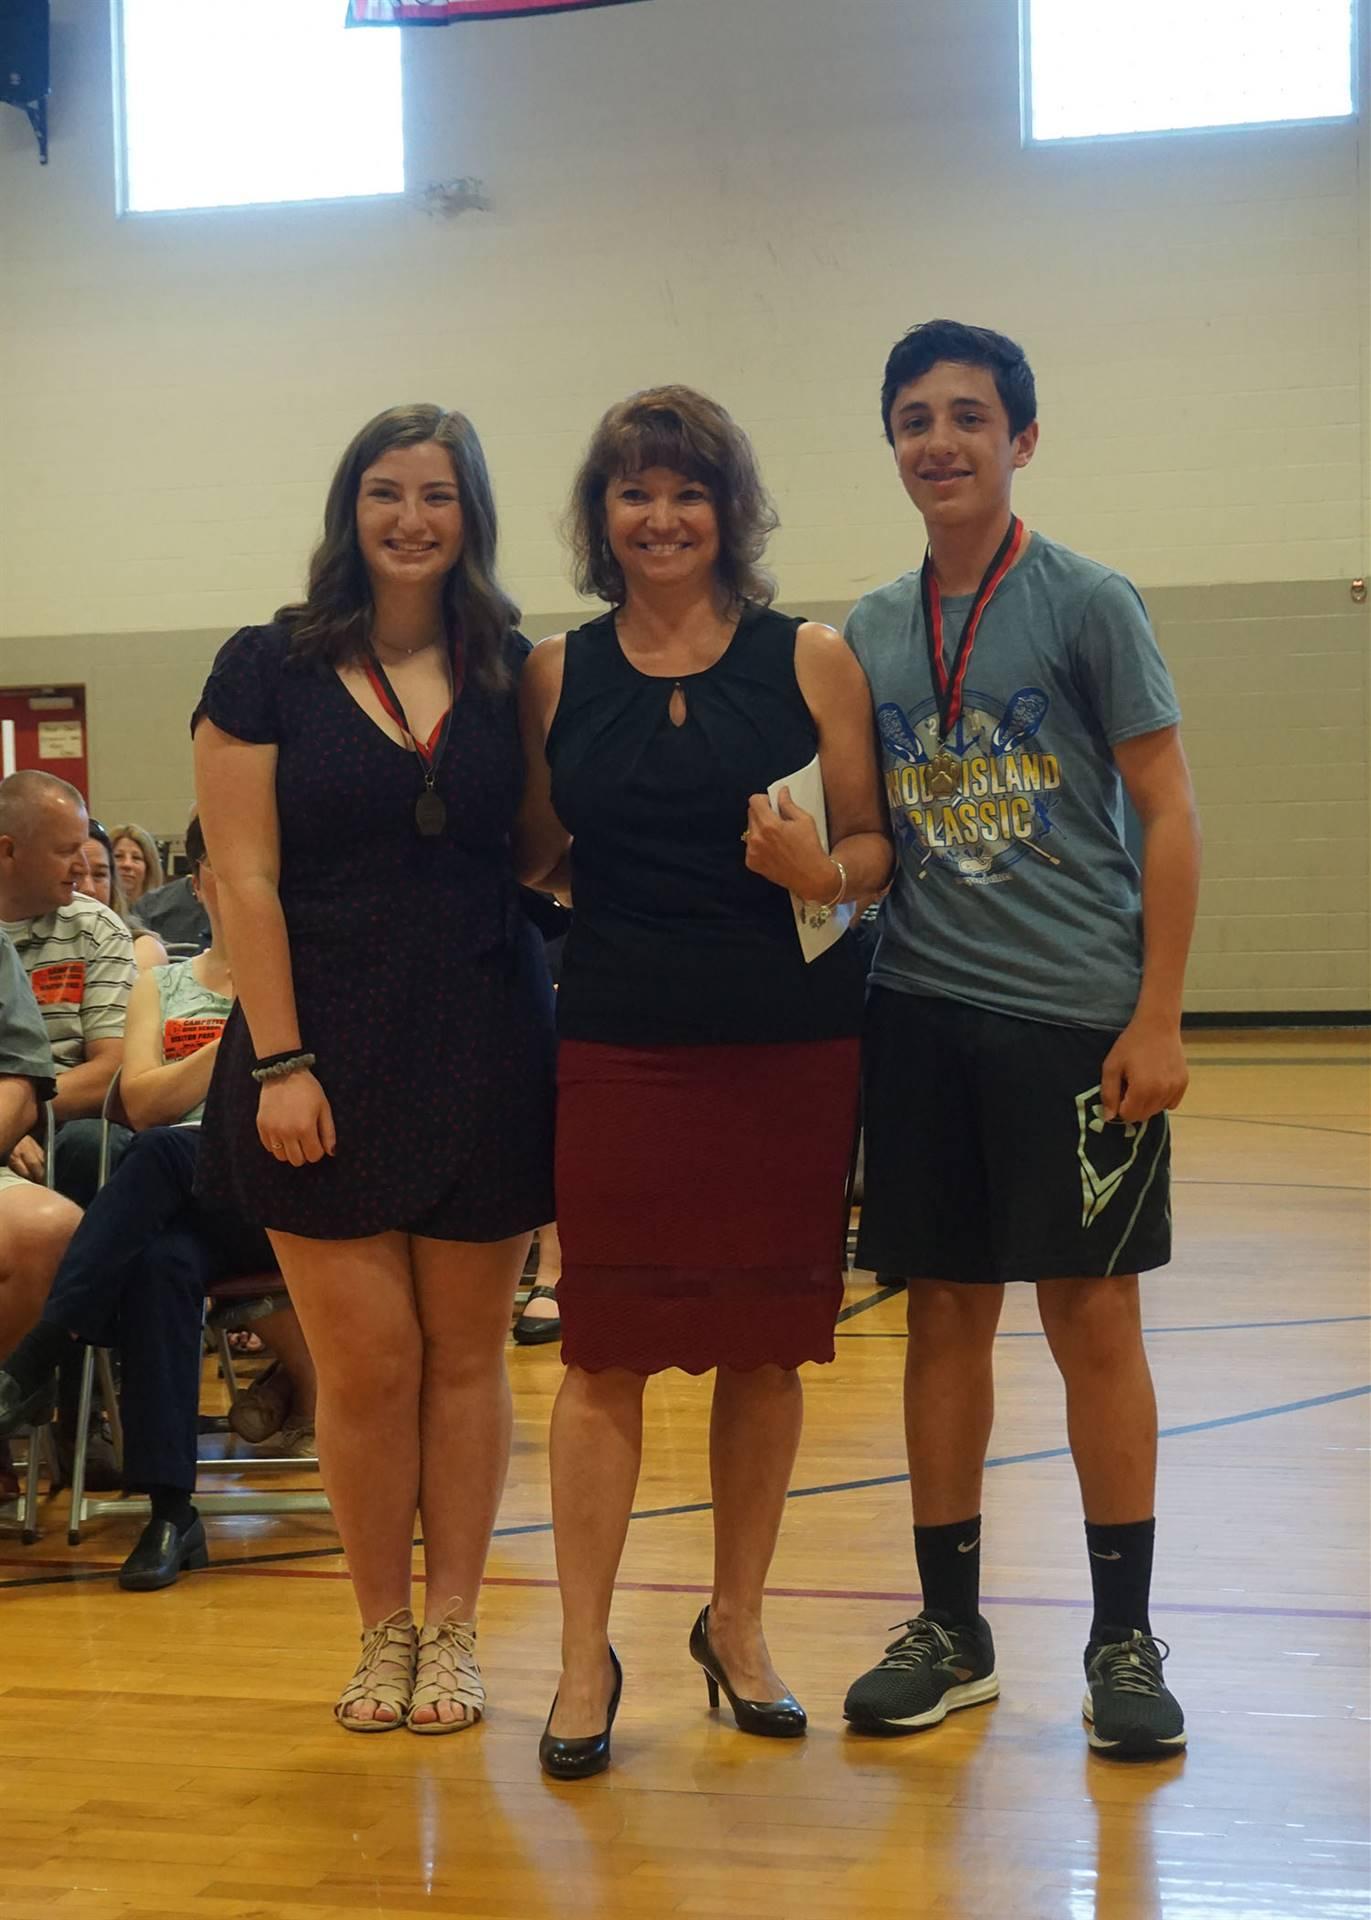 Responsibility award presented to Nick & Kasey